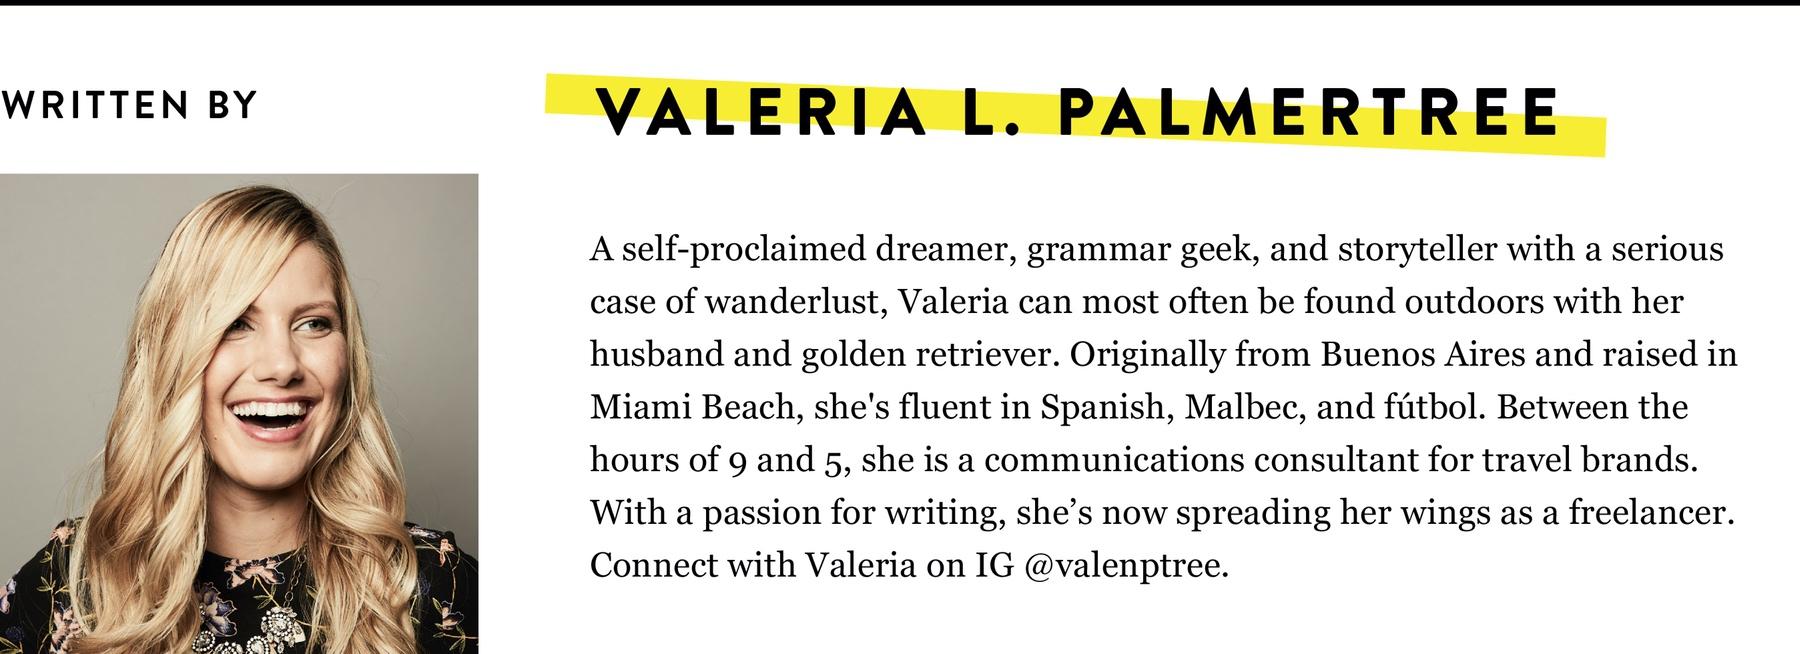 Valeria L. Palmertree BIO